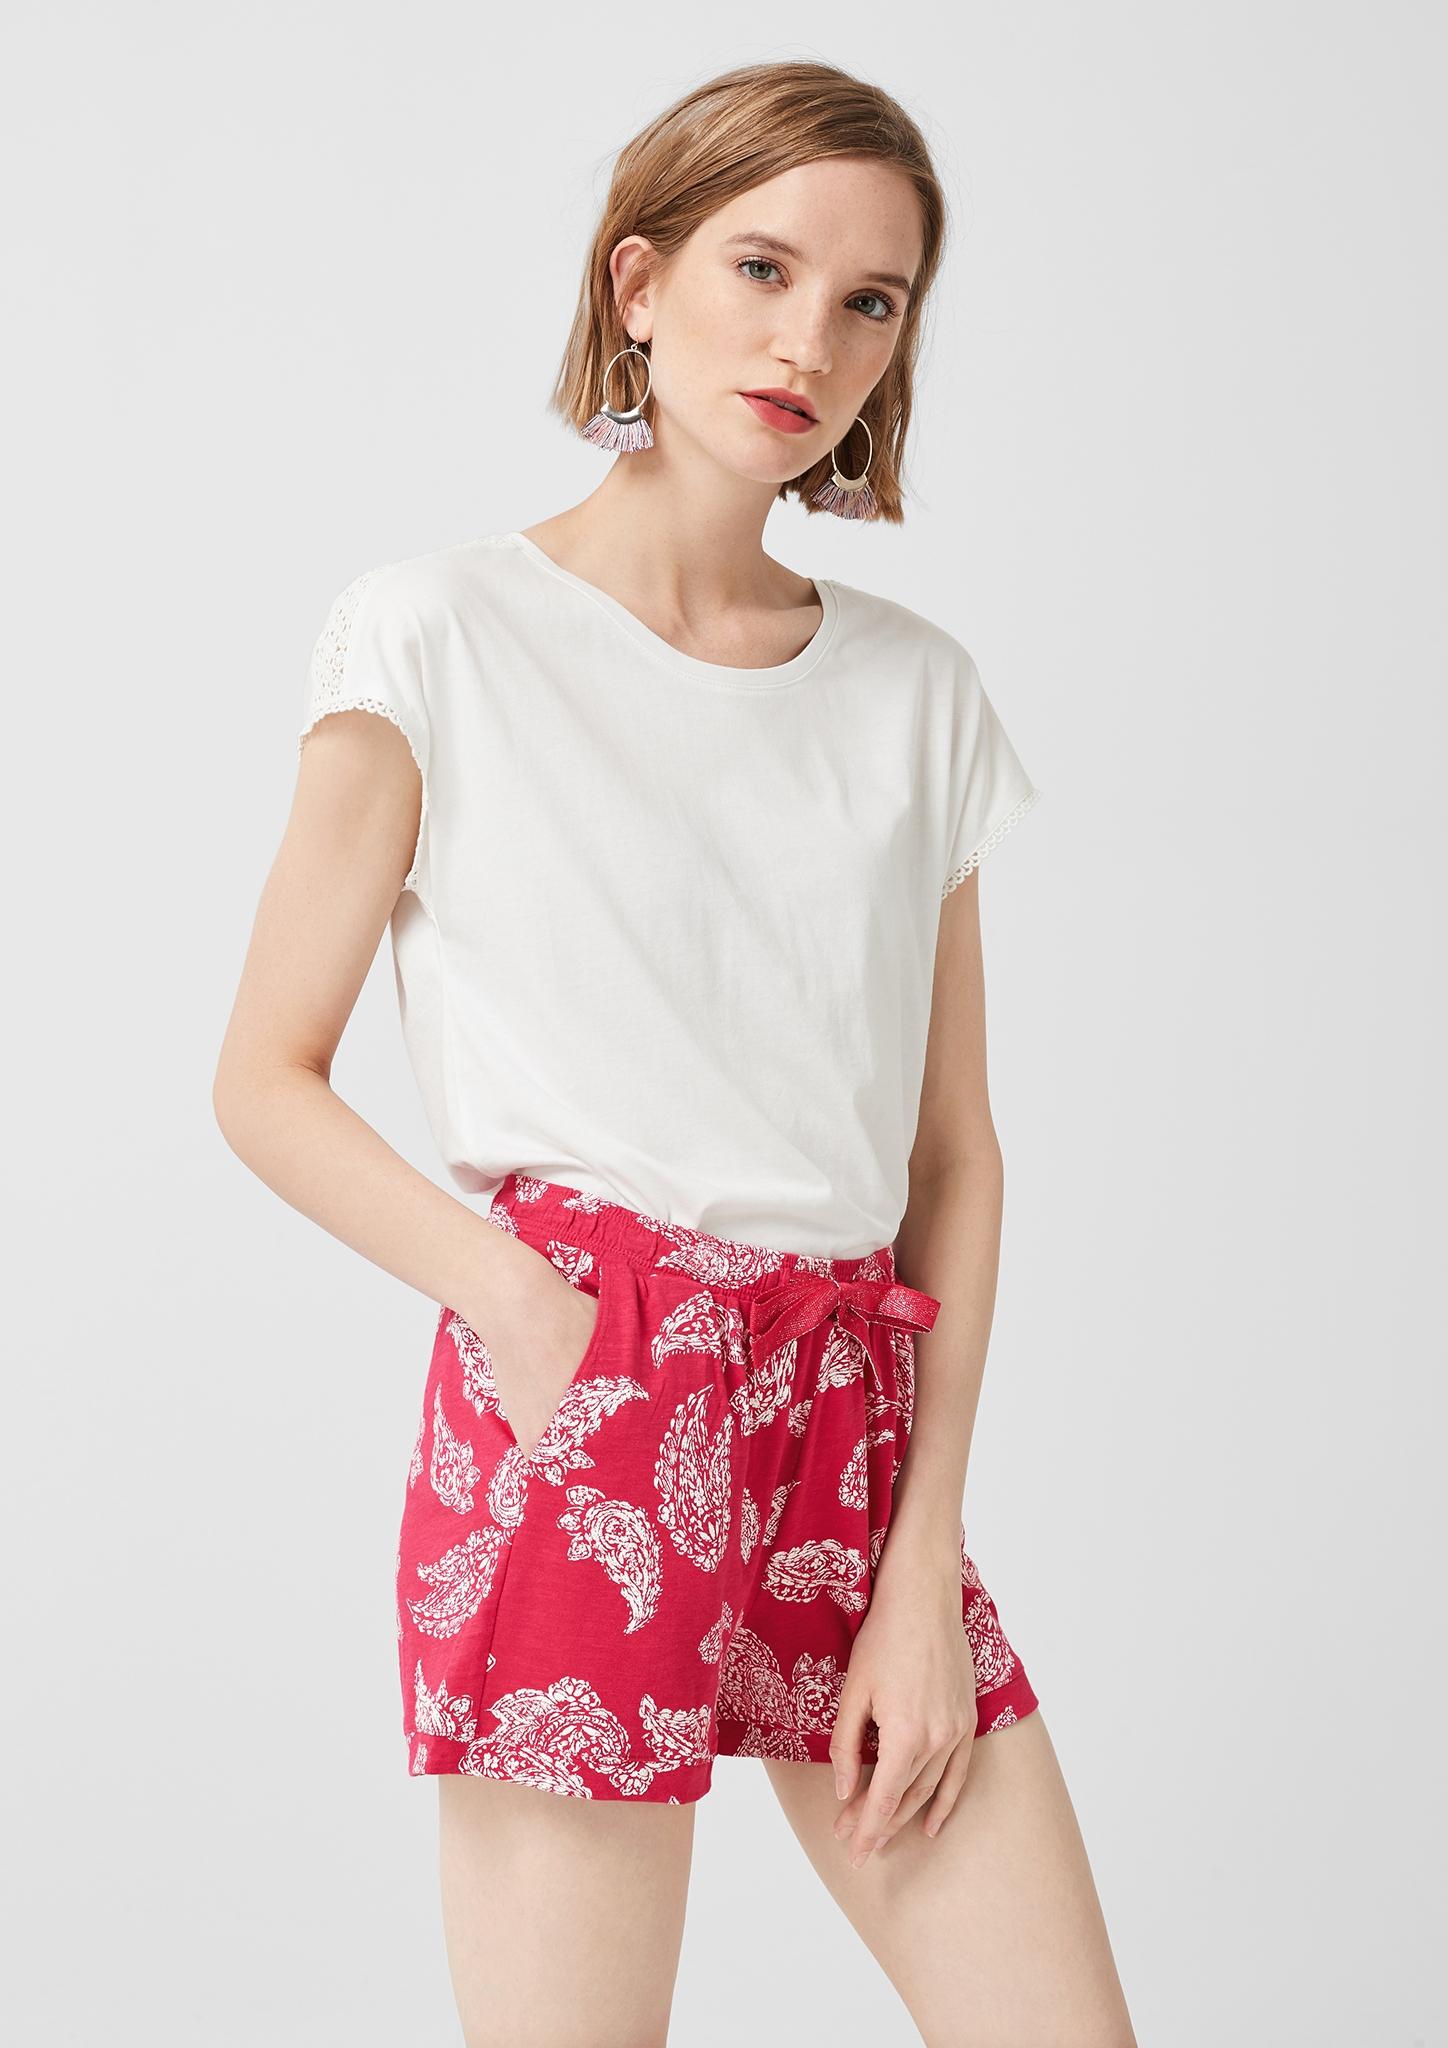 s-Oliver-Casual-Women-Jerseyshorts-mit-Musterprint-Neu Indexbild 19